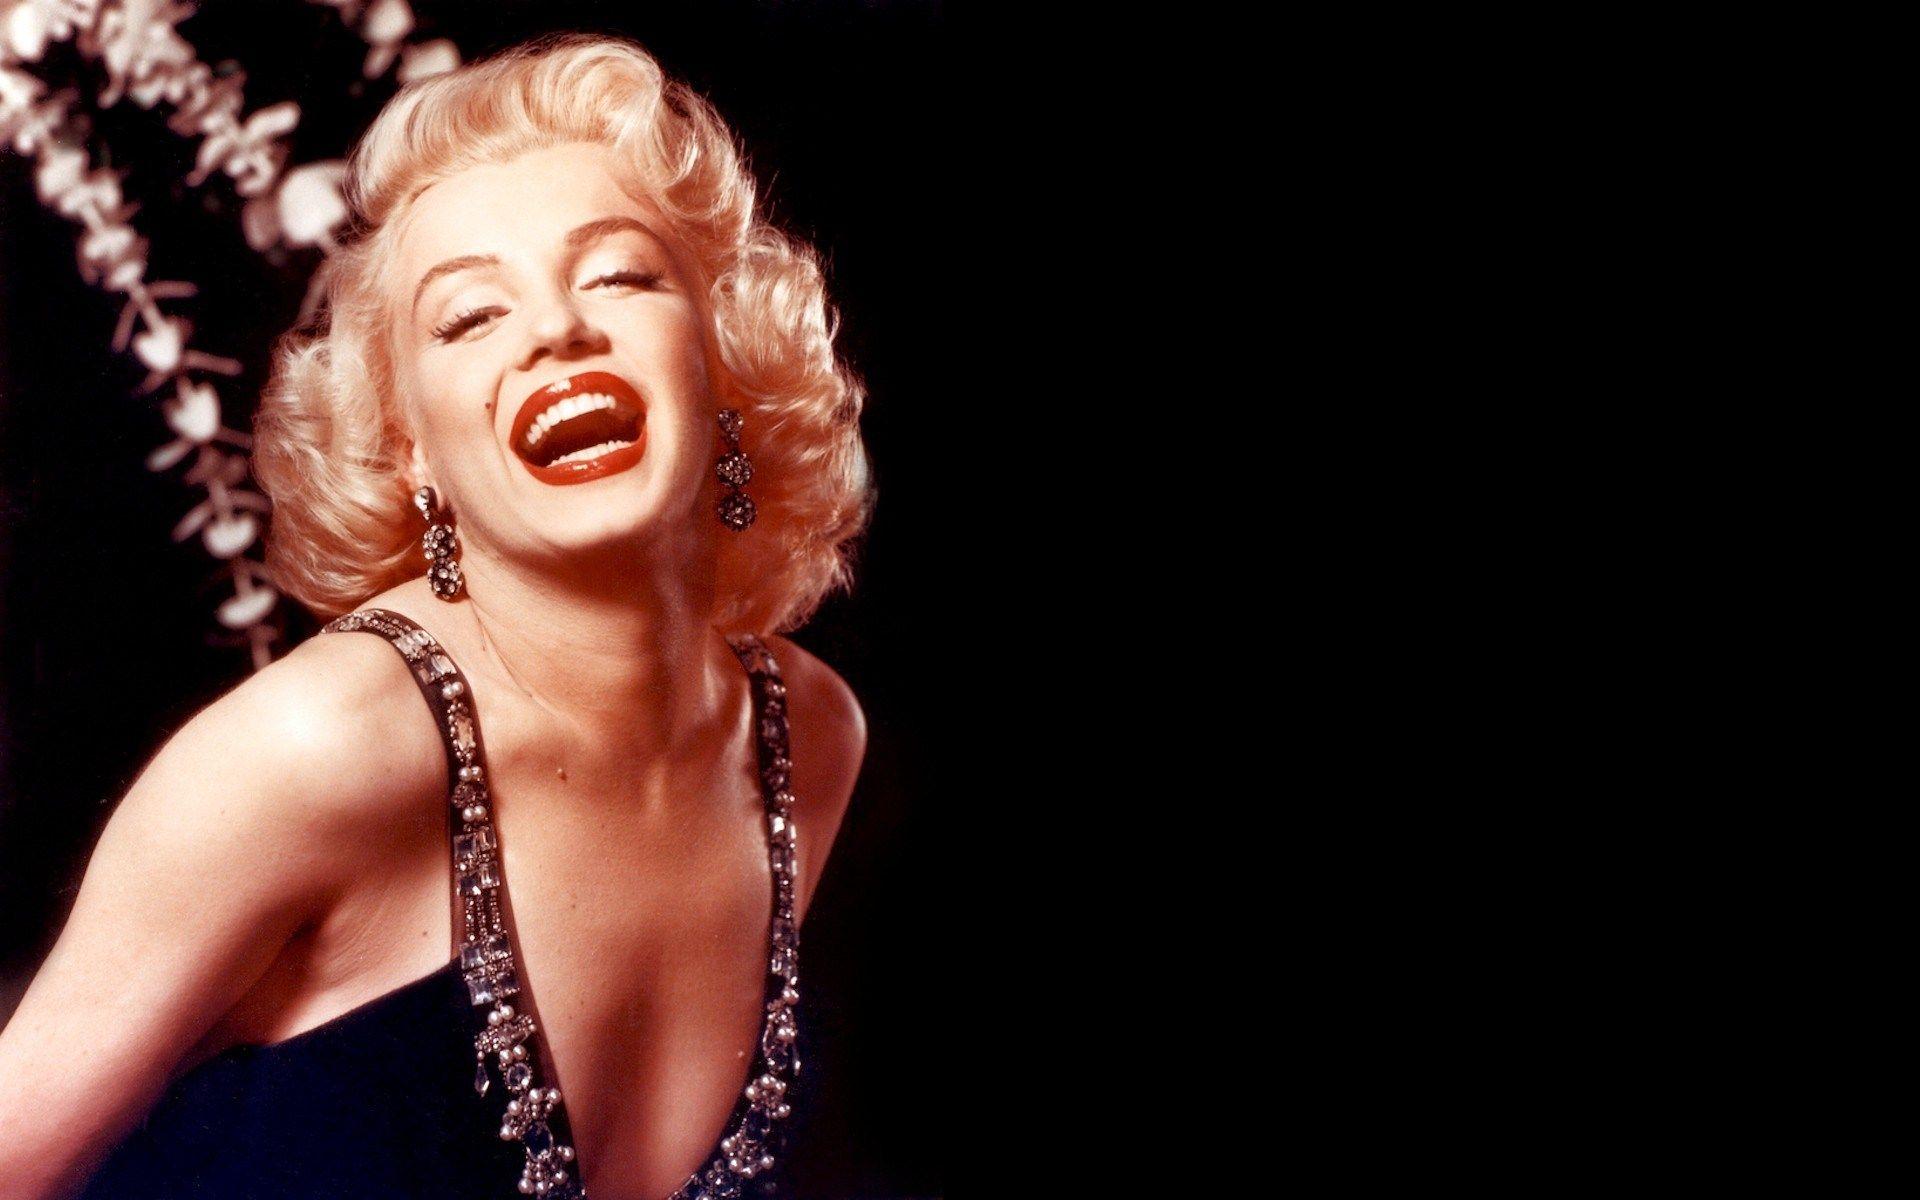 Most Beautiful Marilyn Monroe Wallpaper Hintergrundbilder Desktop Hintergrund Manson Marylin